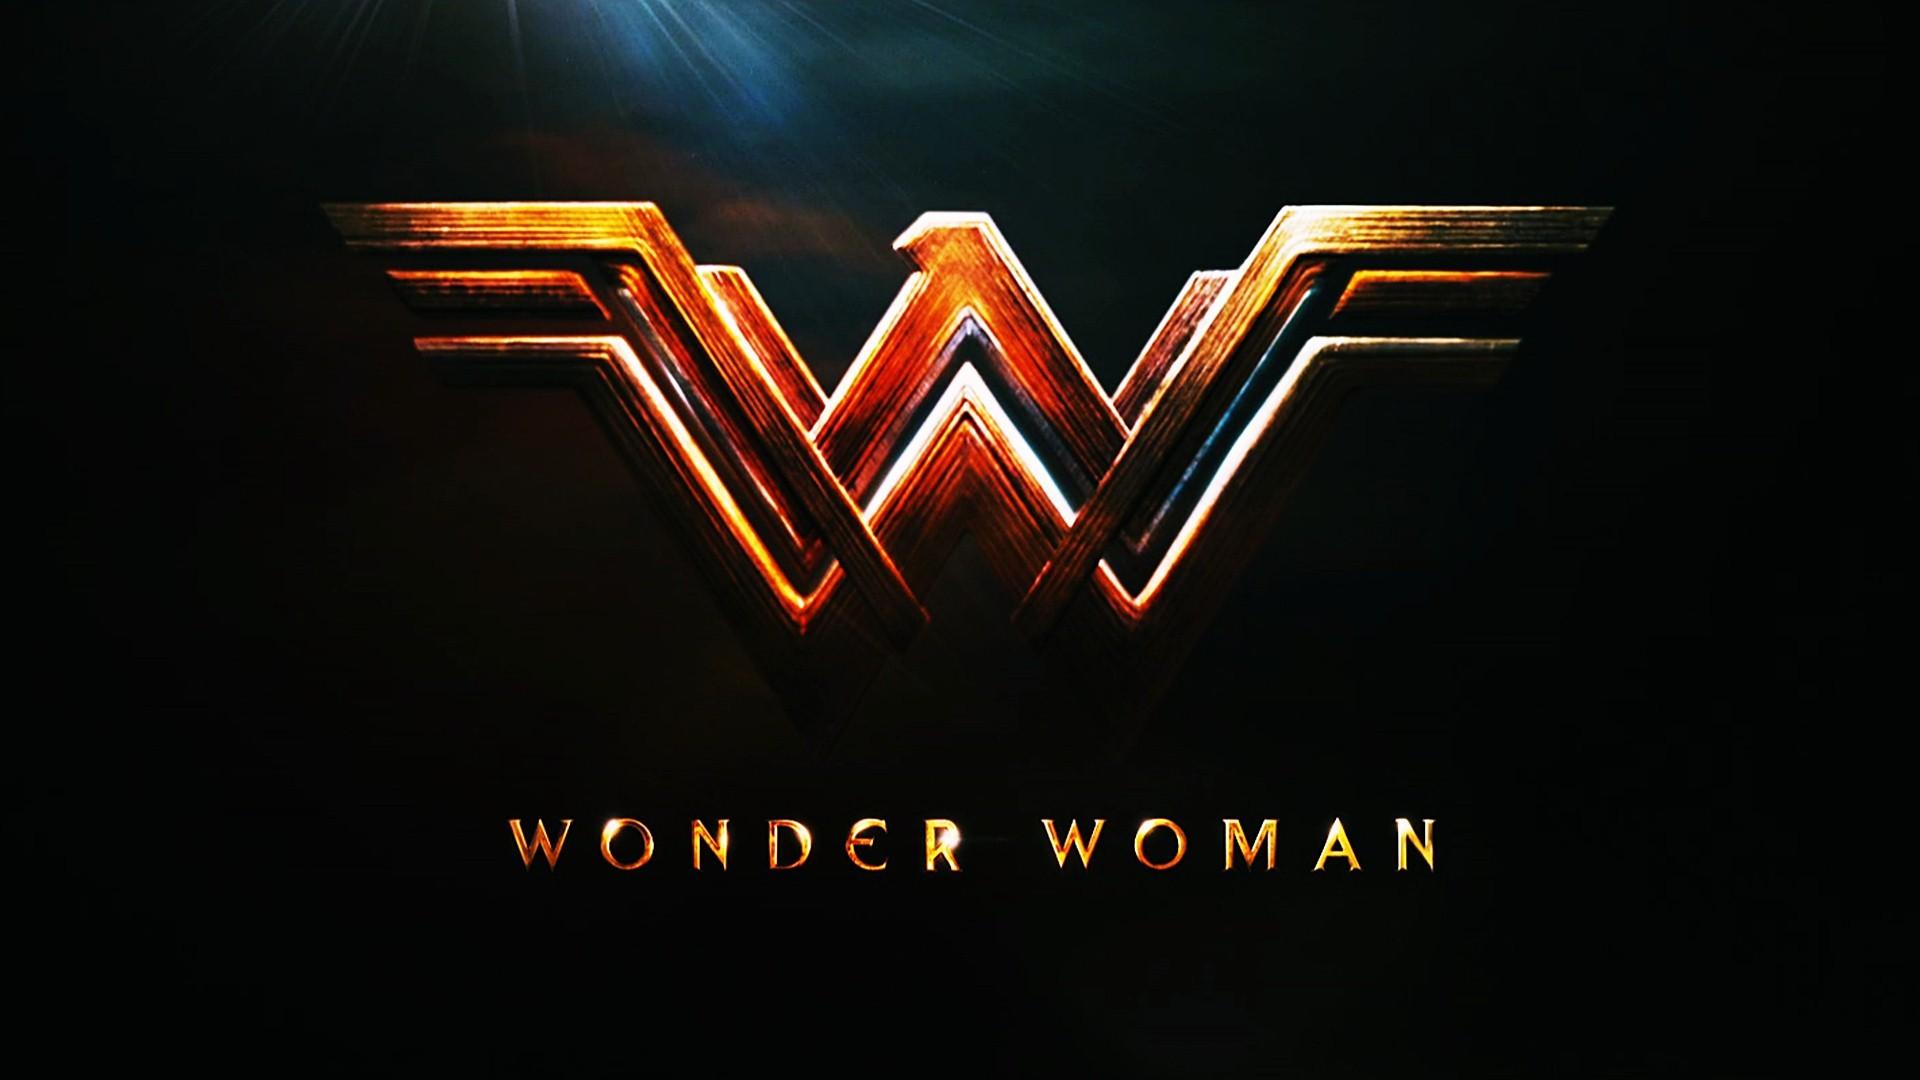 Cars Movie Hd Wallpapers 1080p Wonder Woman Logo Wallpaper 61 Images